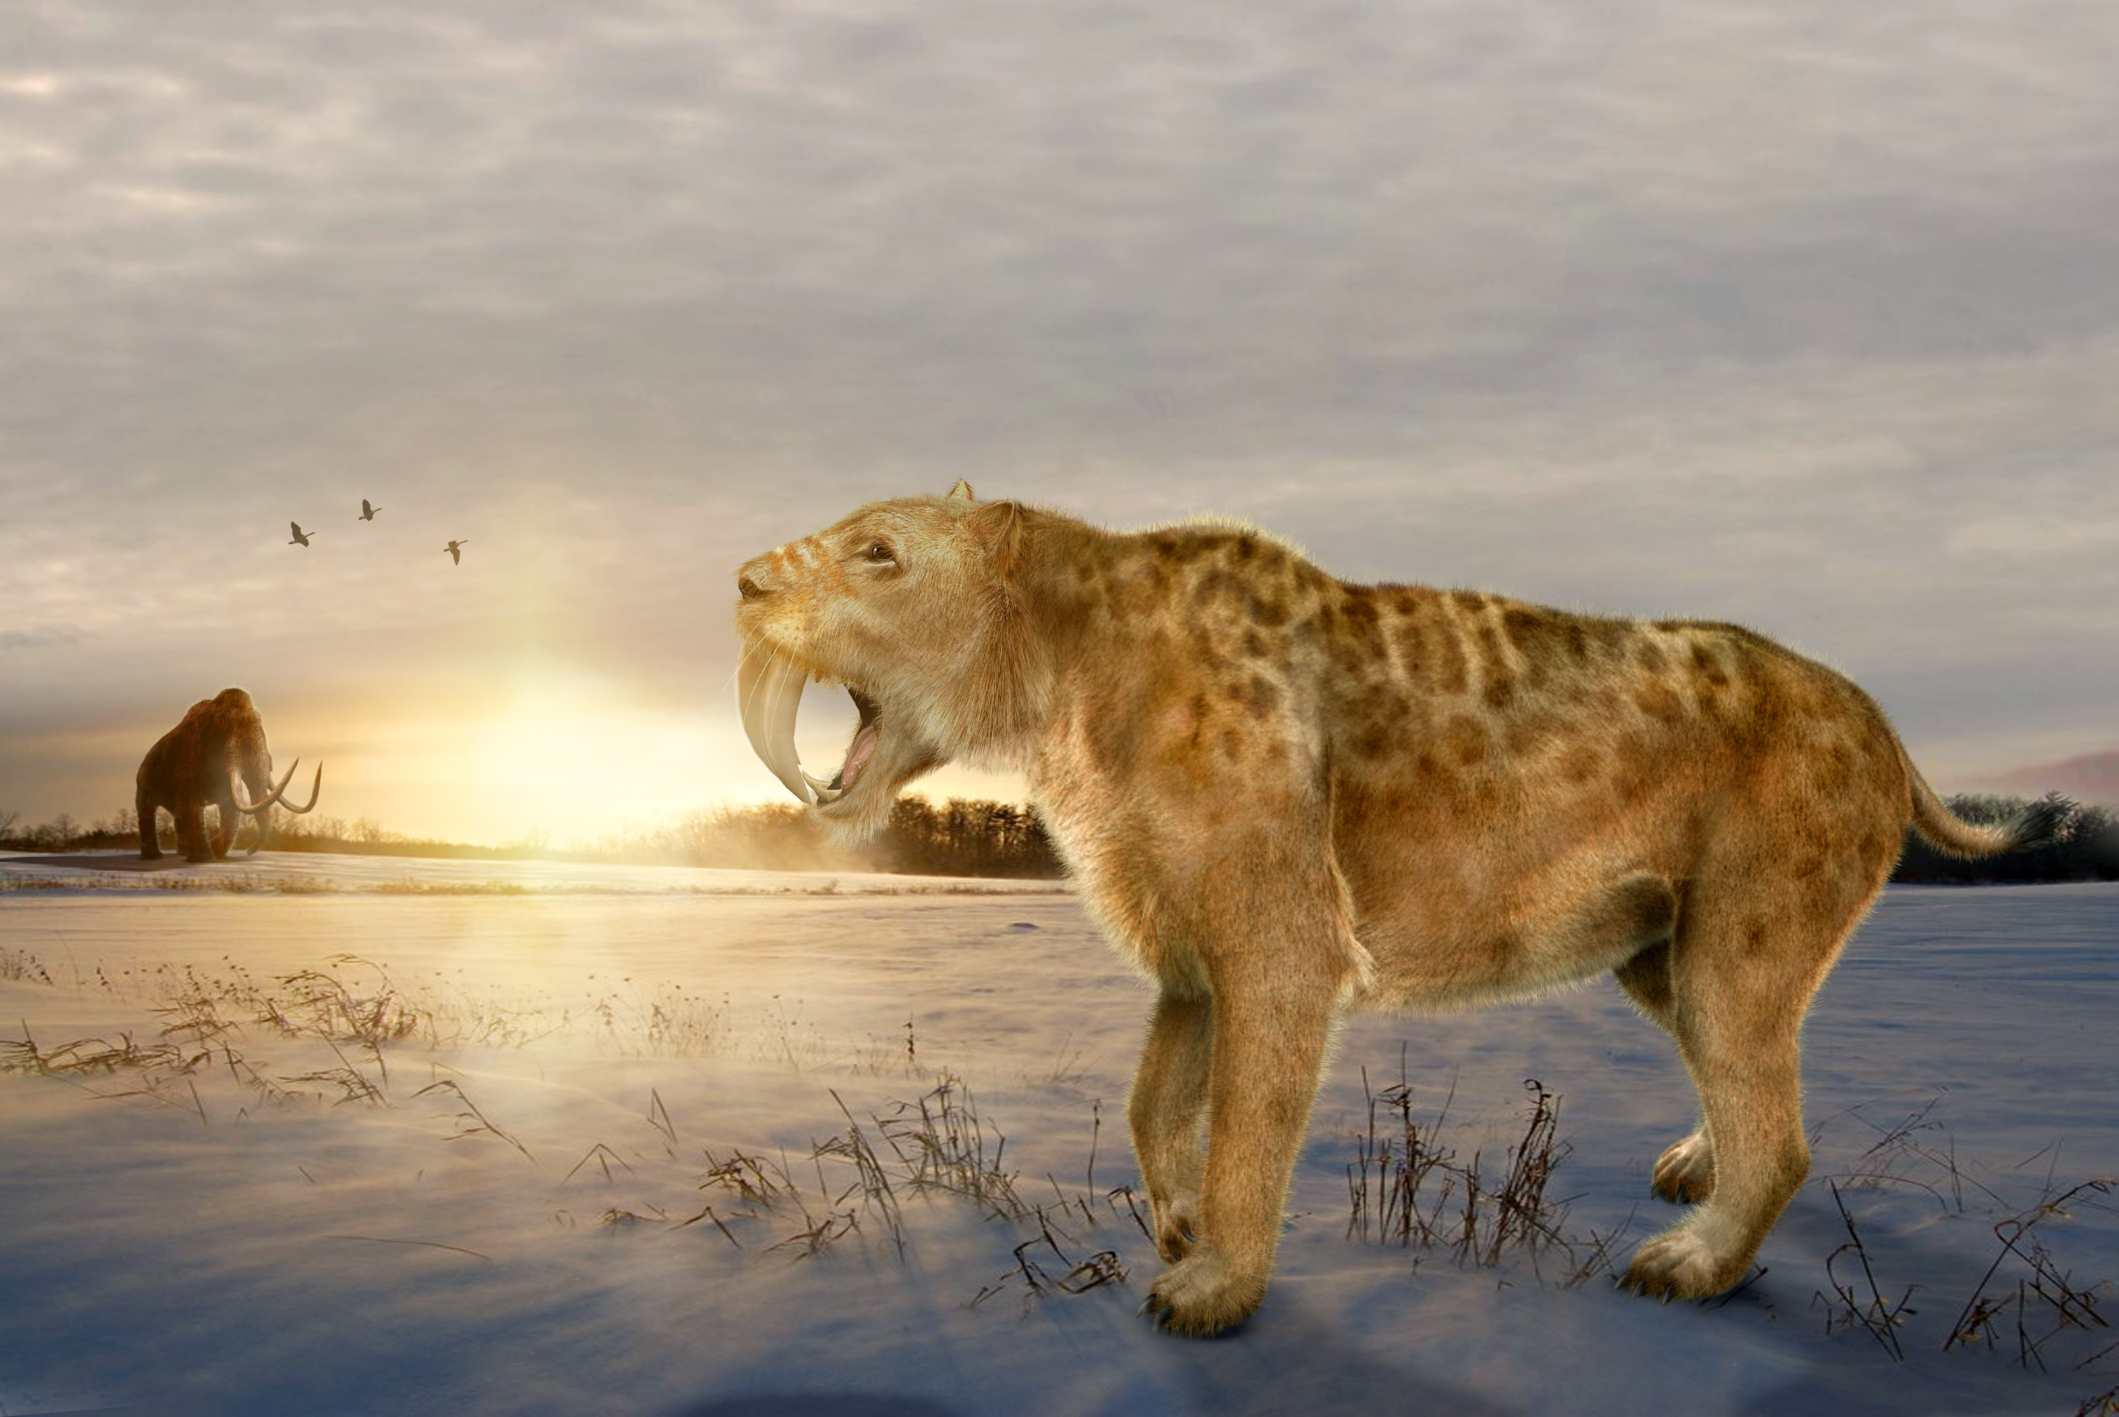 An artist rendering of prehistoric times